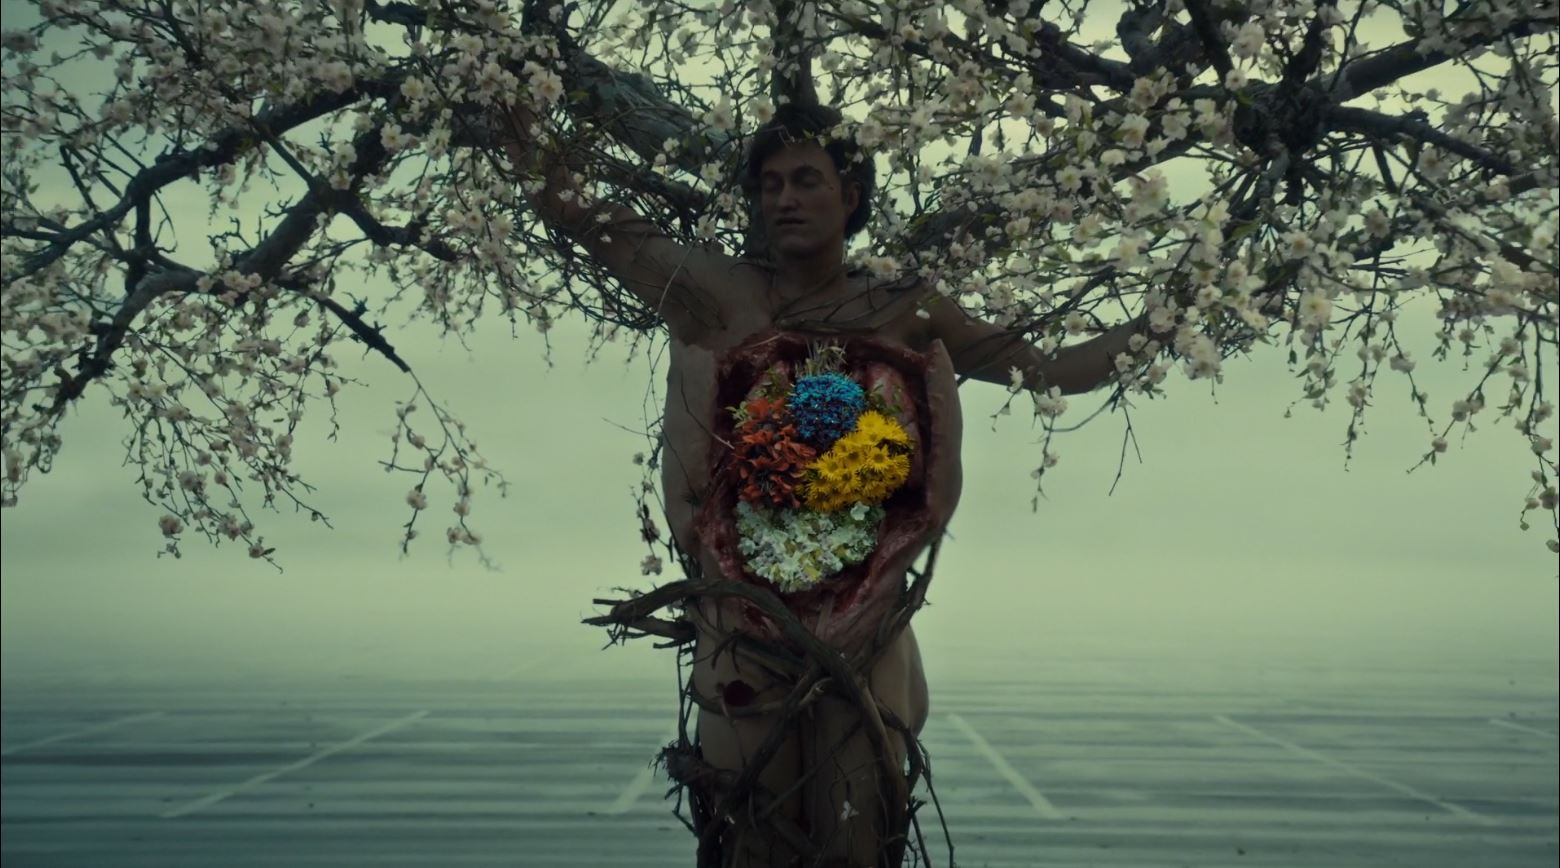 Hannibal S2Ep6 Futamono Review - Hannibal's latest victim